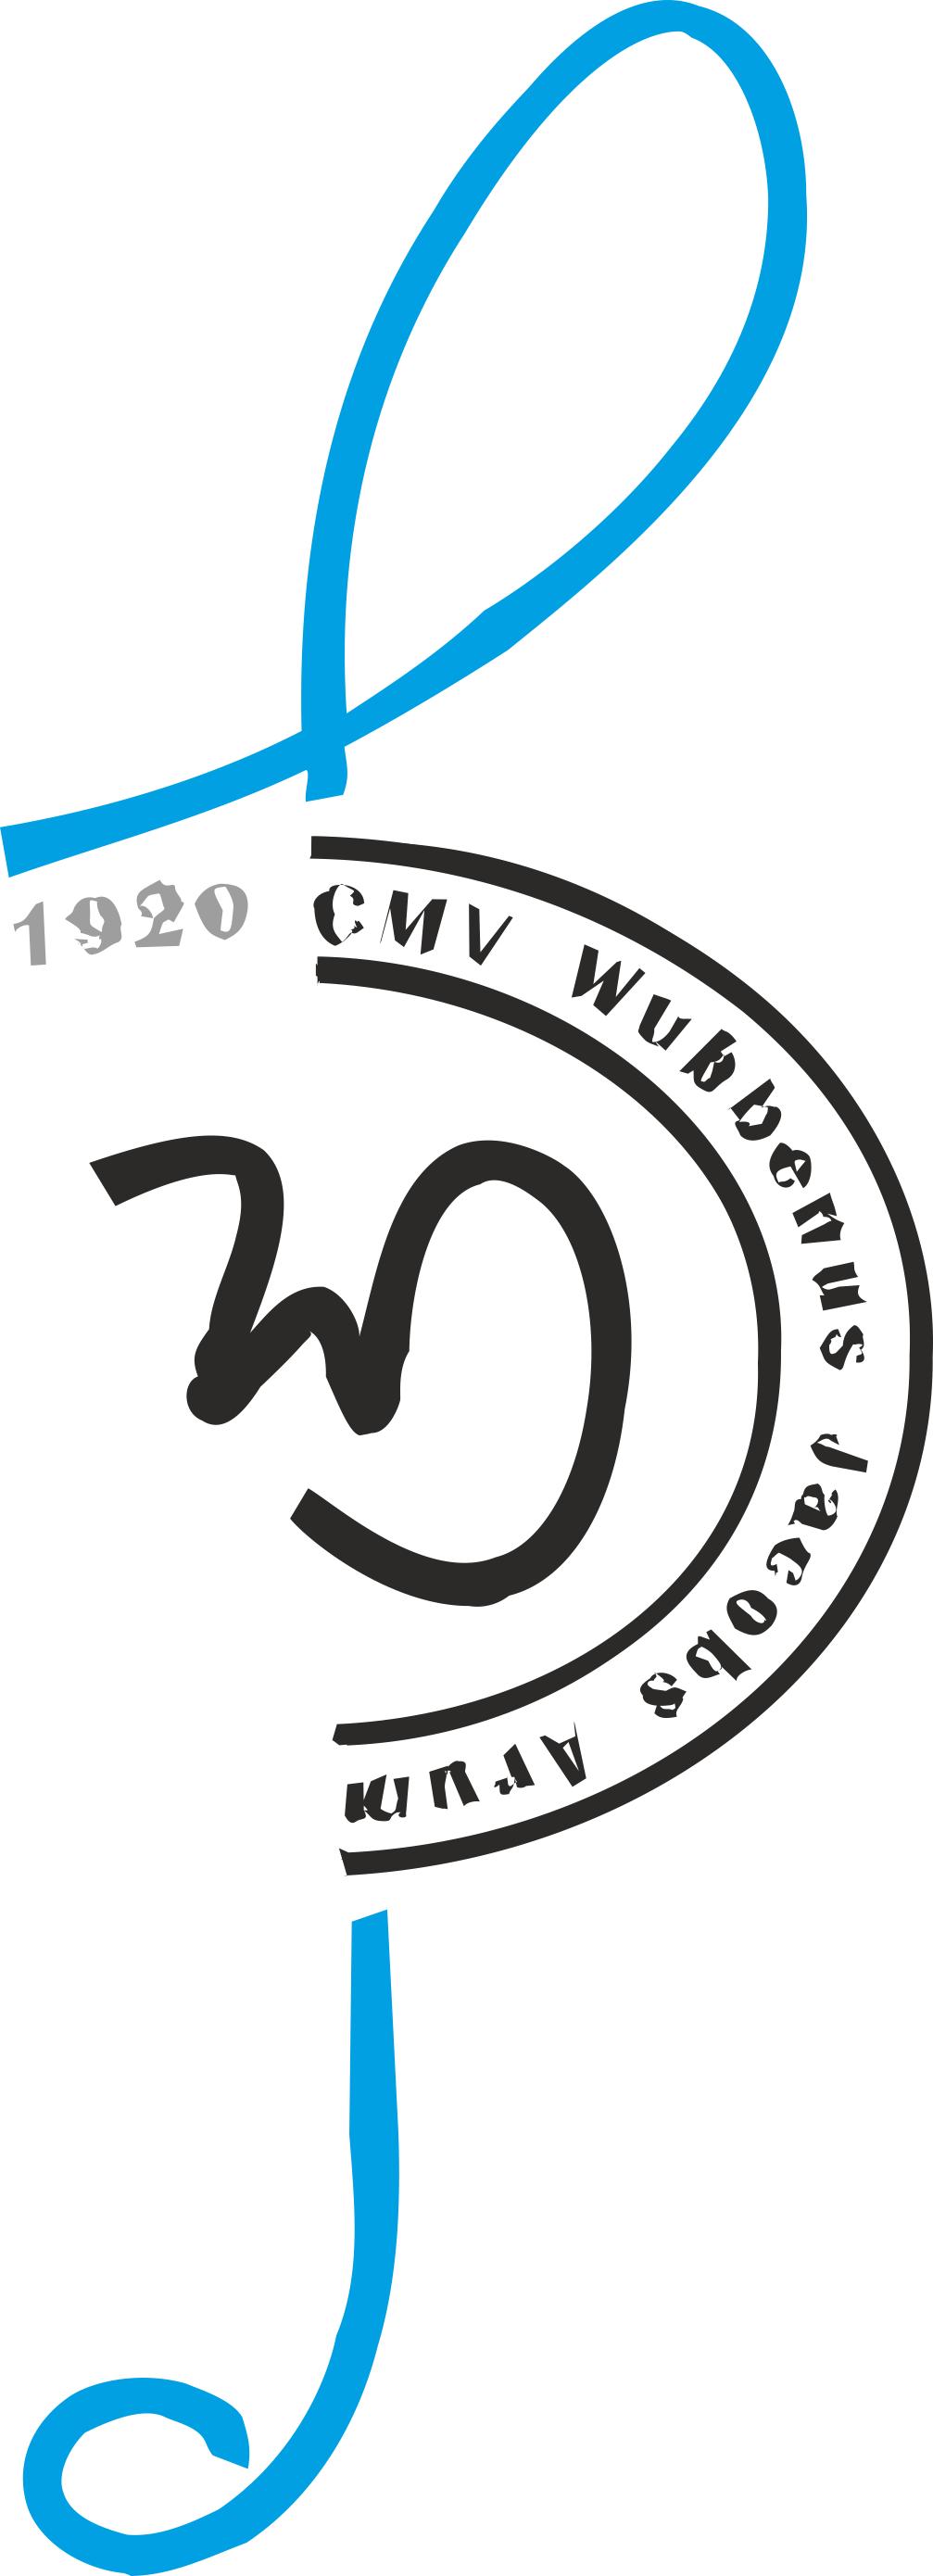 CMV Wubbenus Jacobs